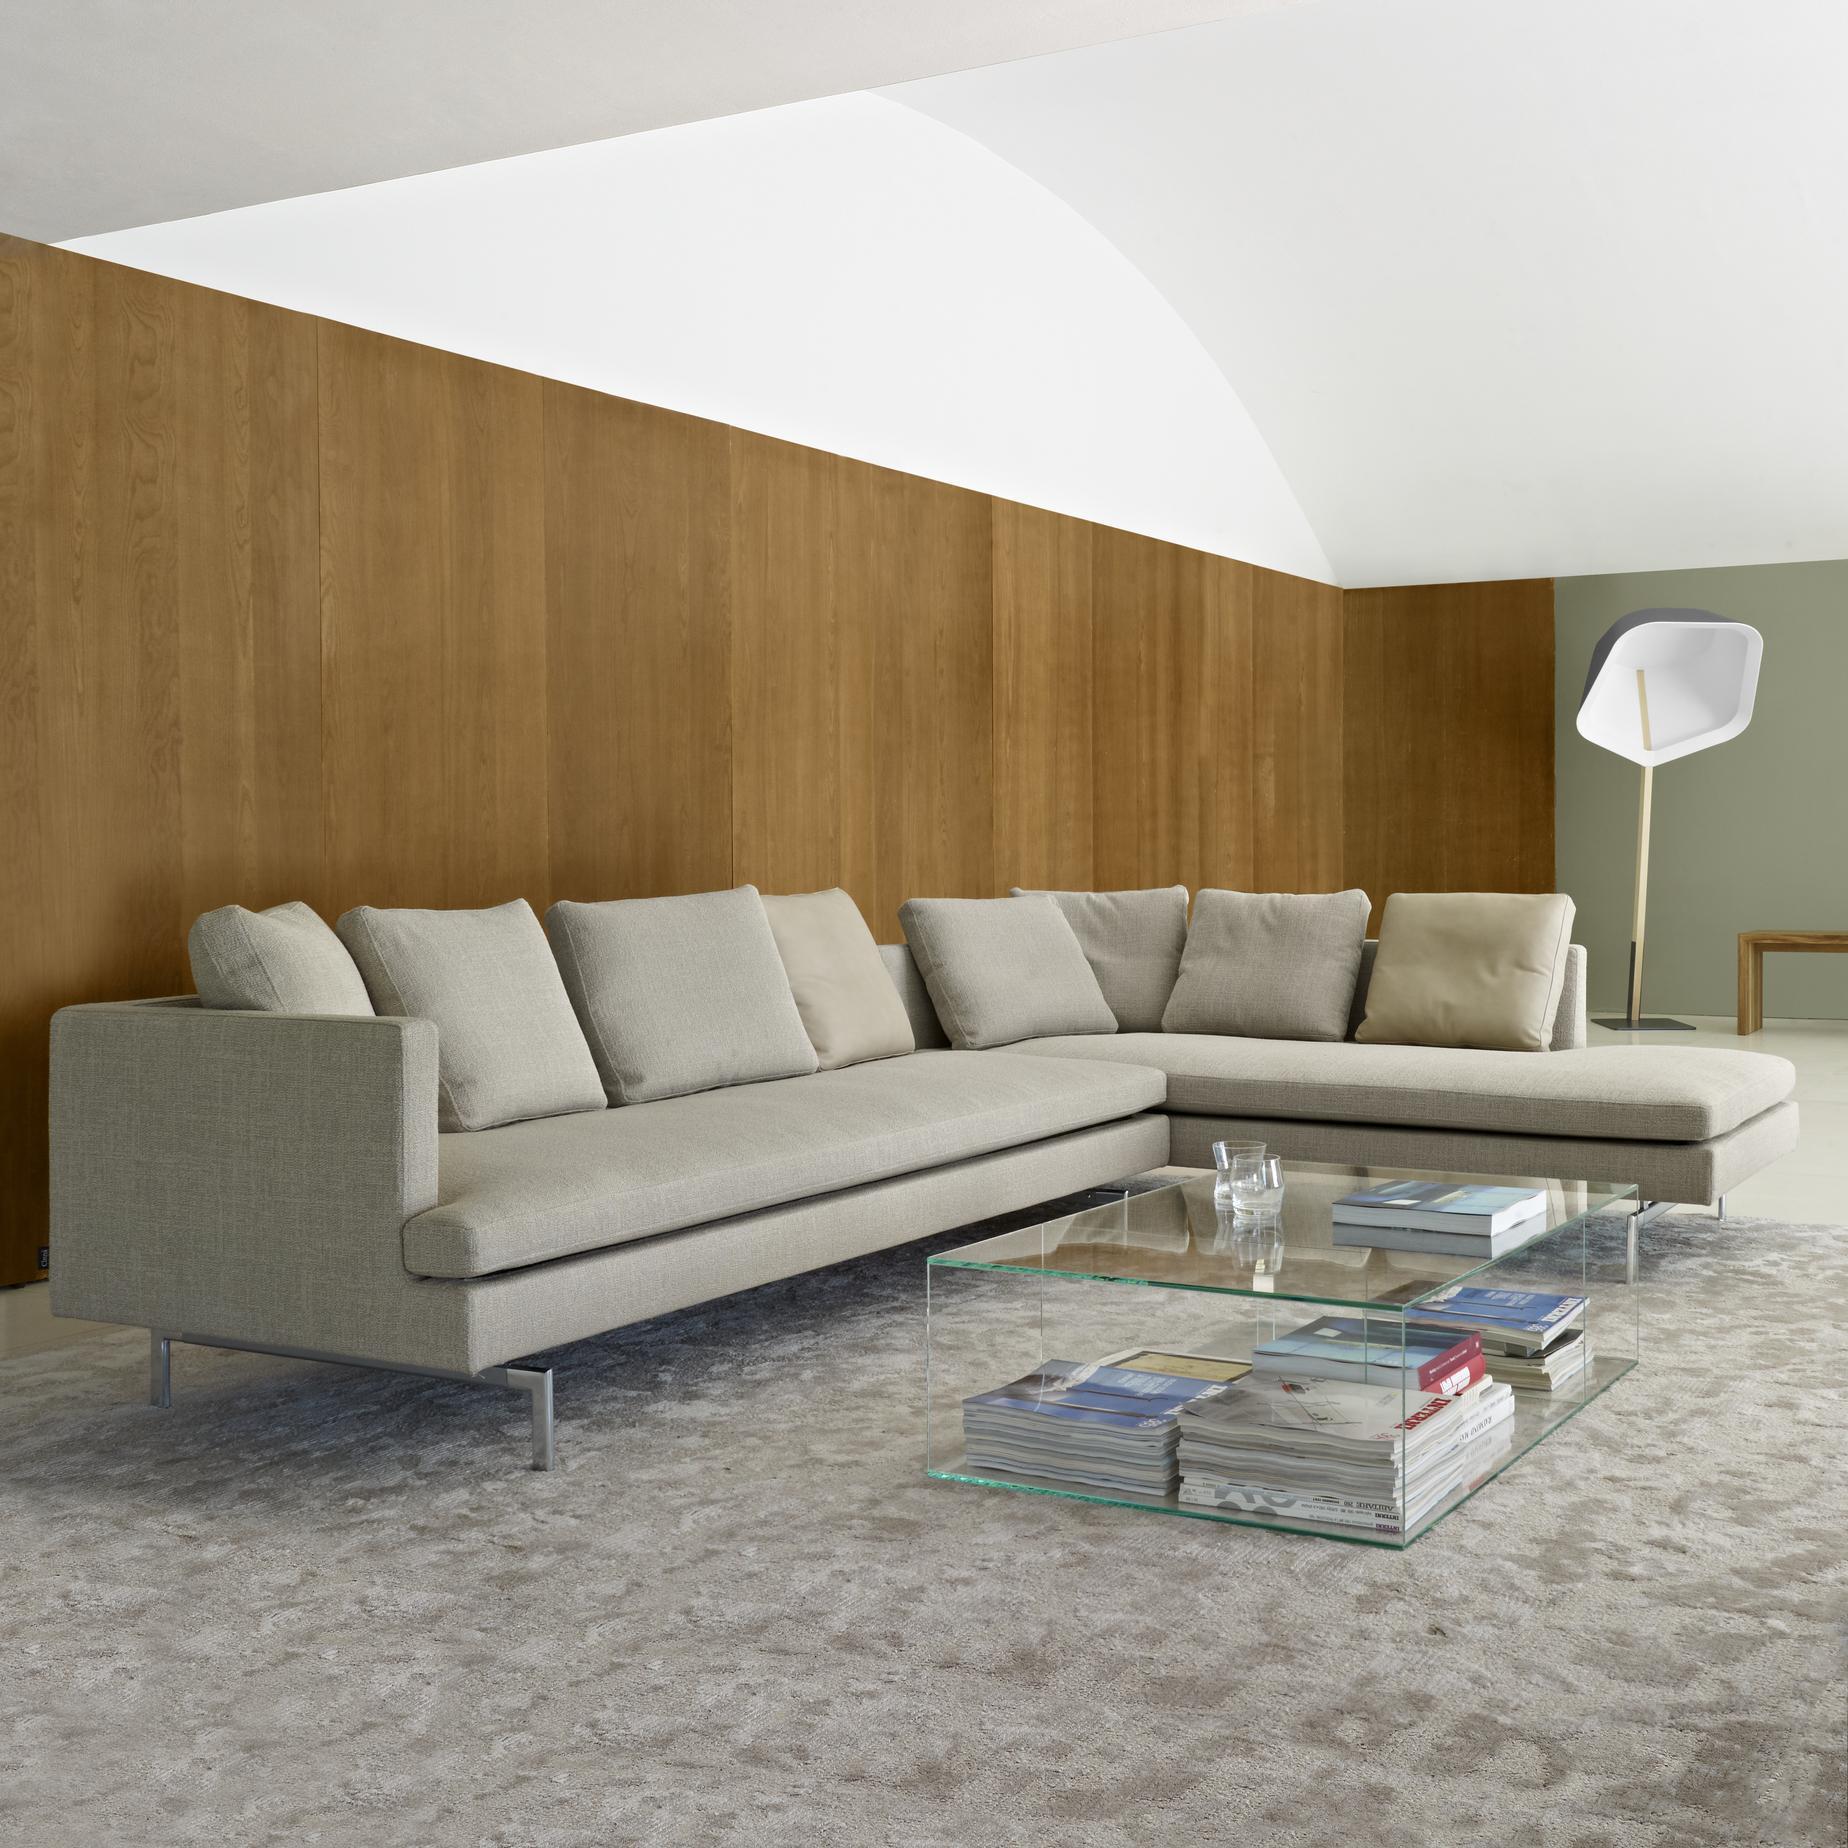 Stricto sensu sofas designer didier gomez ligne roset previous parisarafo Choice Image